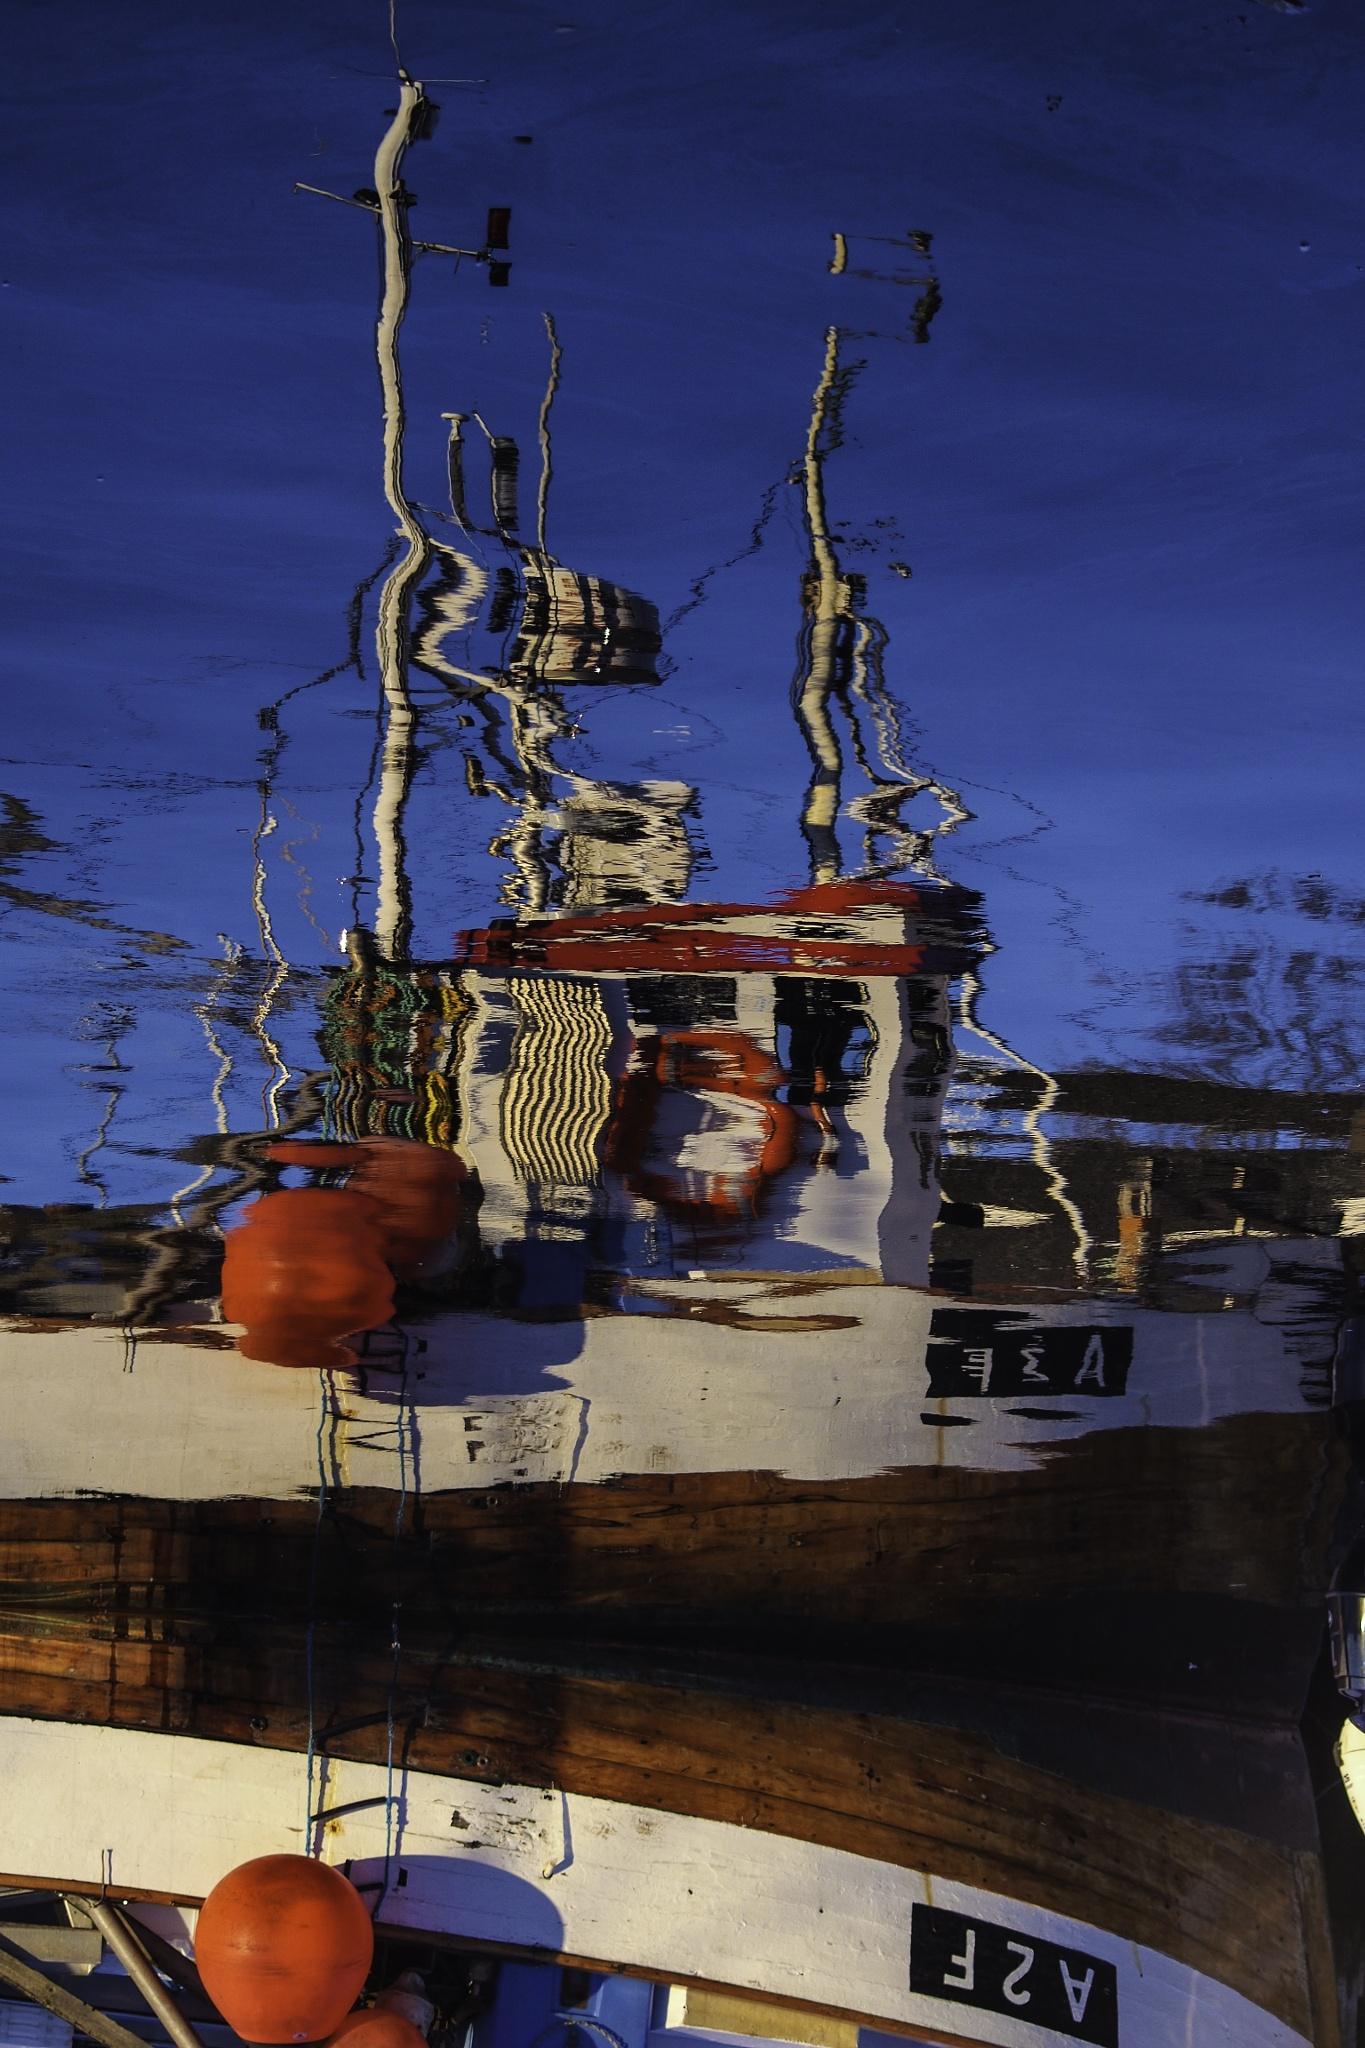 Boat & The Sea by Goran Jorganovich